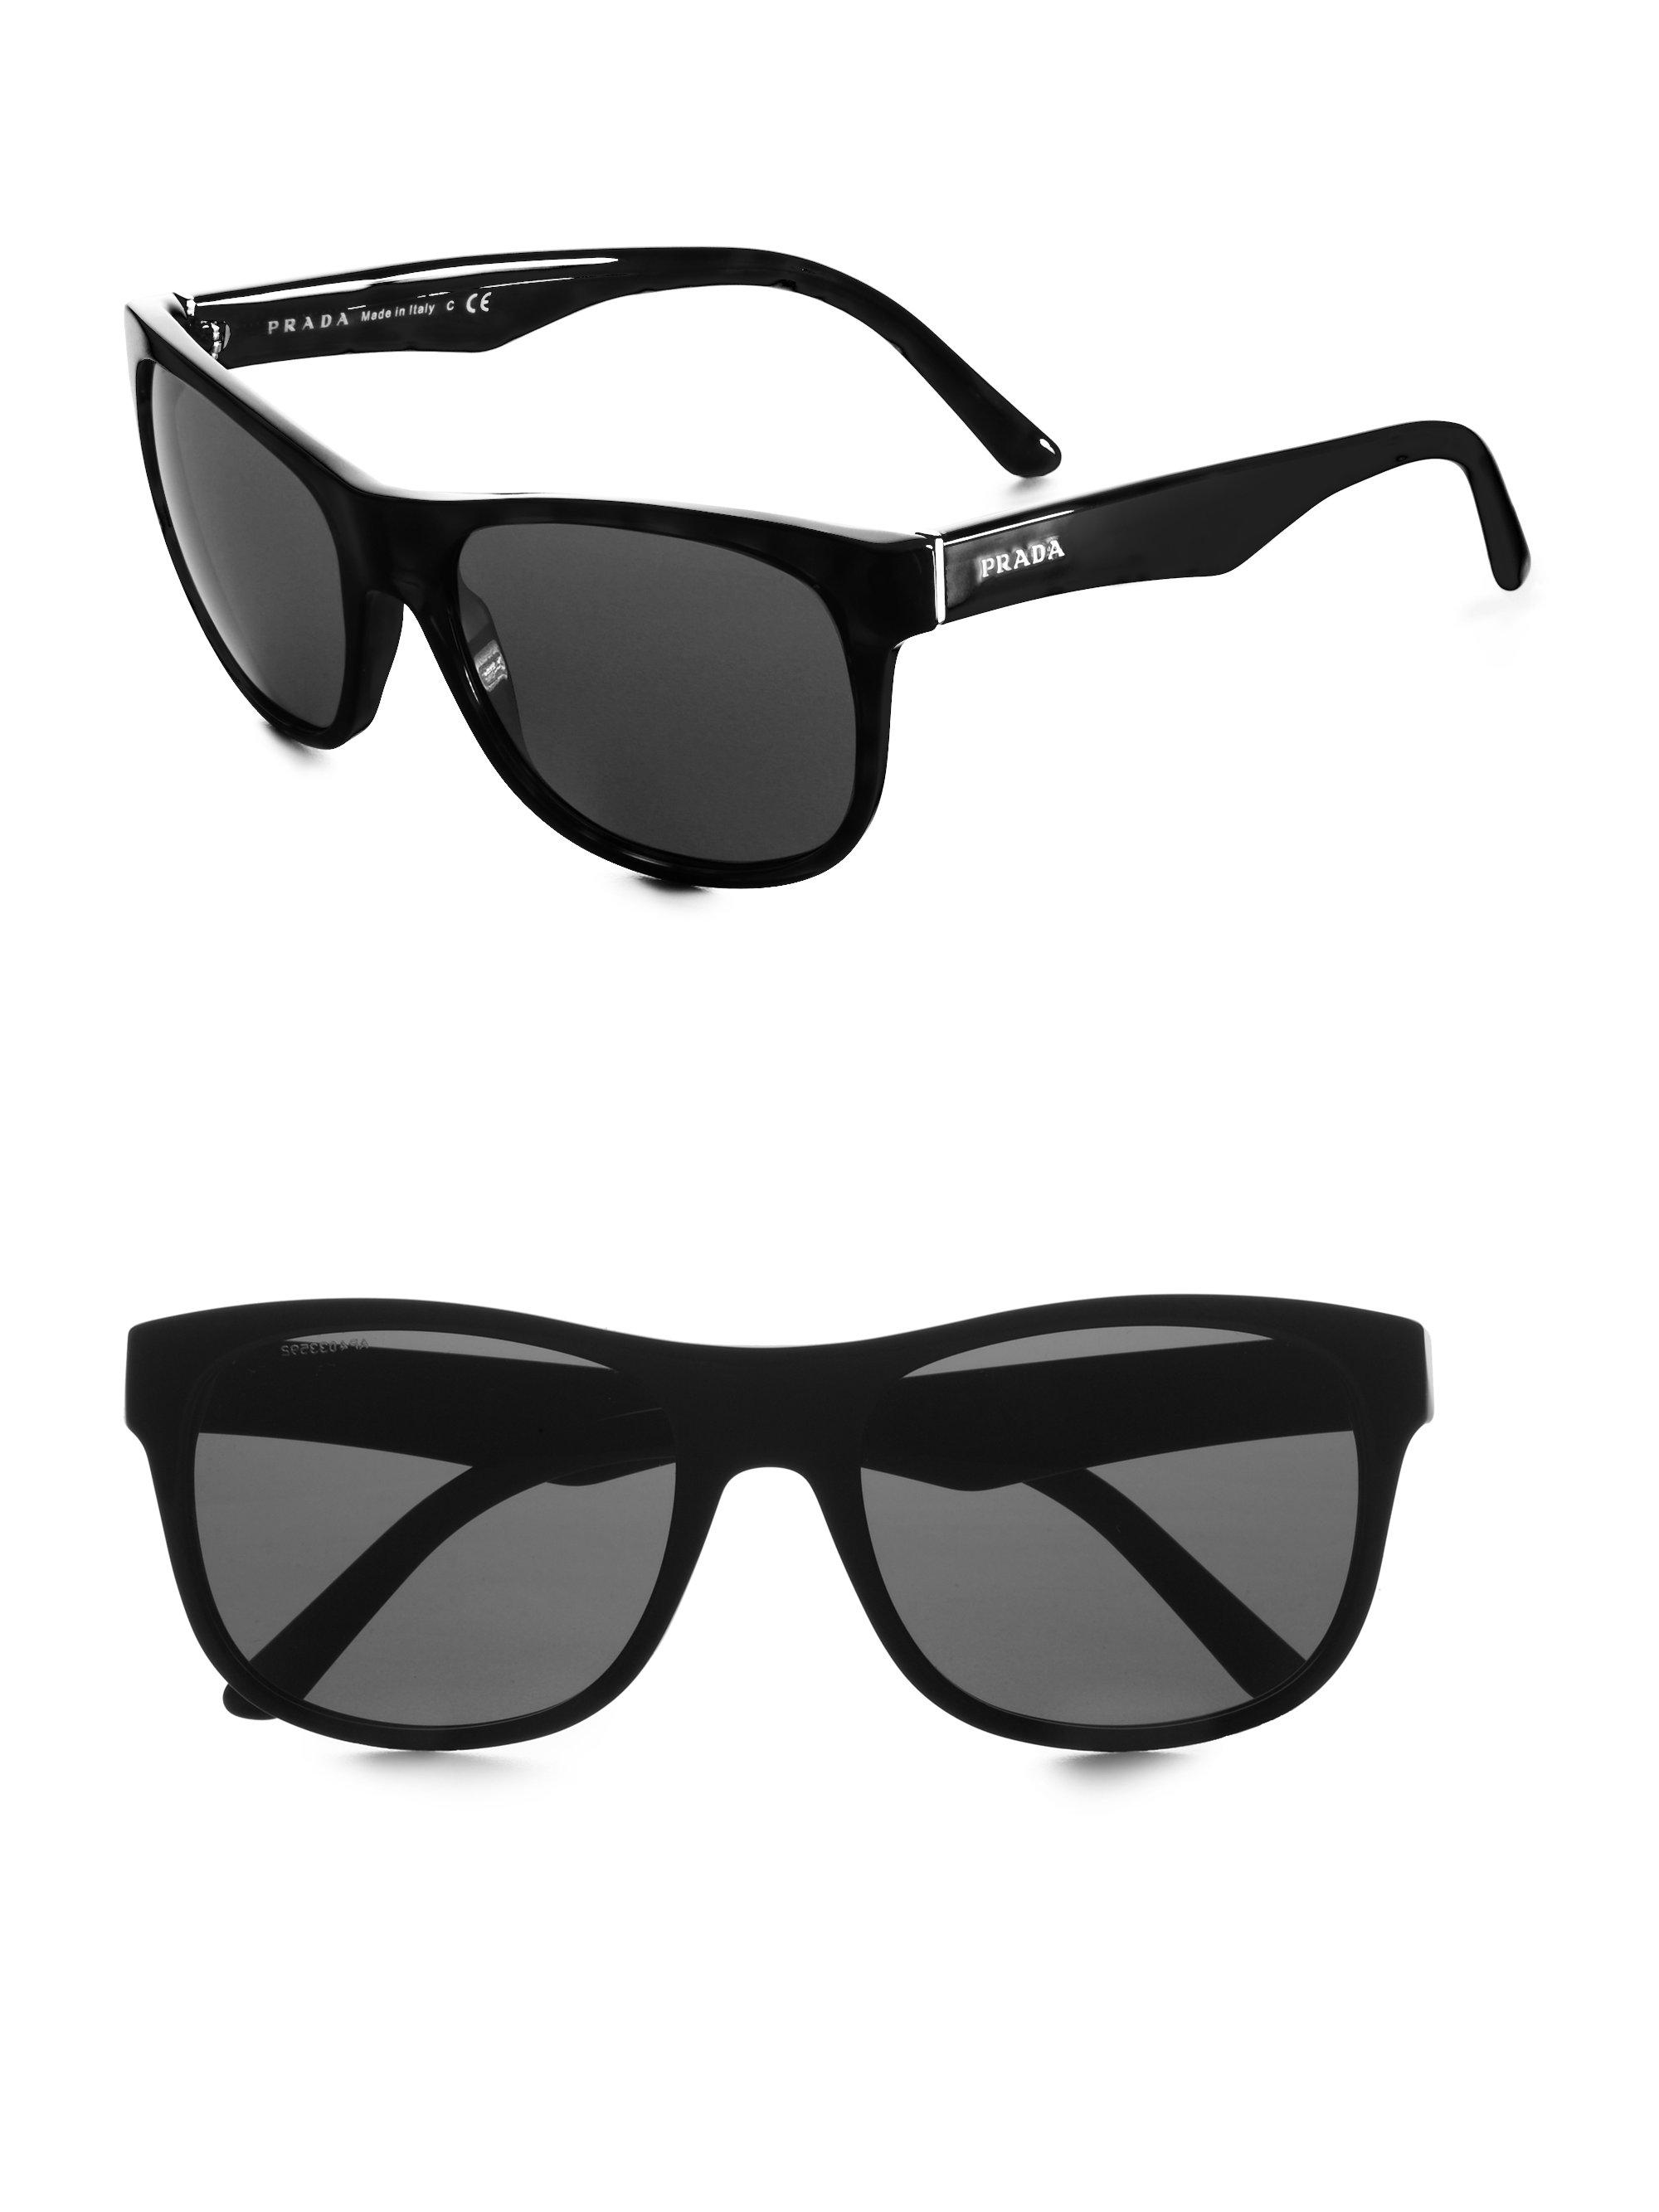 10f604a71df33 ... get lyst prada wayfarer sunglasses in black for men 591c7 276d3